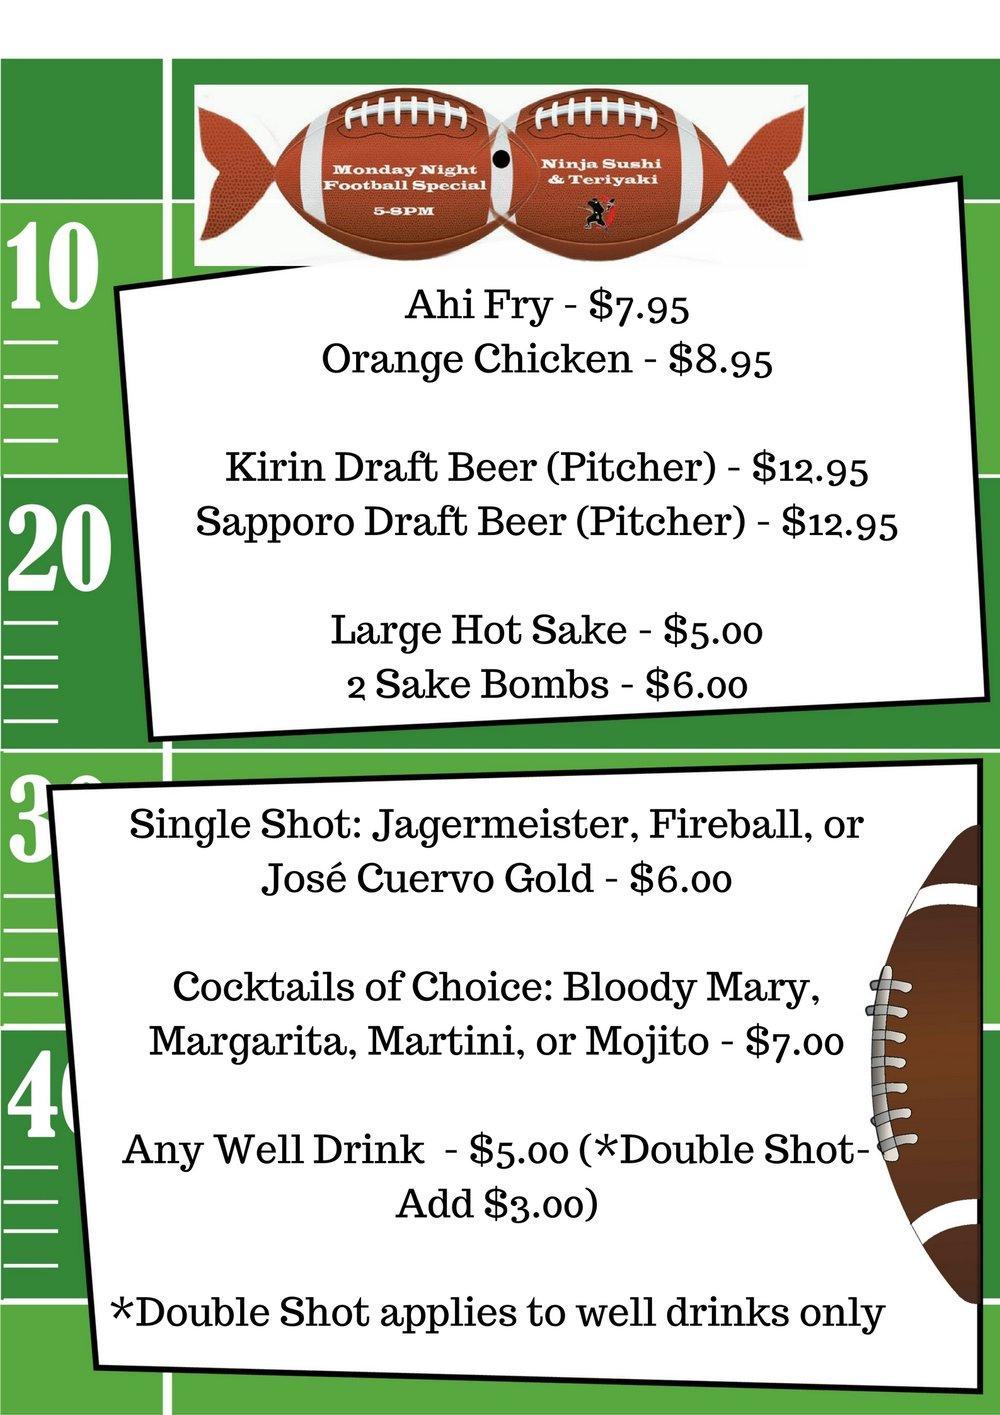 Ahi Fry - $7.95Orange Chicken - $8.95Kirin Draft Beer (Pitcher) - $12.95Sapporo Draft Beer (Pitcher) - $12.95Large Hot Sake - $5.002 Sake Bombs - $6.00Any Well Drink - $5.00 (Double Shot - Add $3.00)- (3).jpg